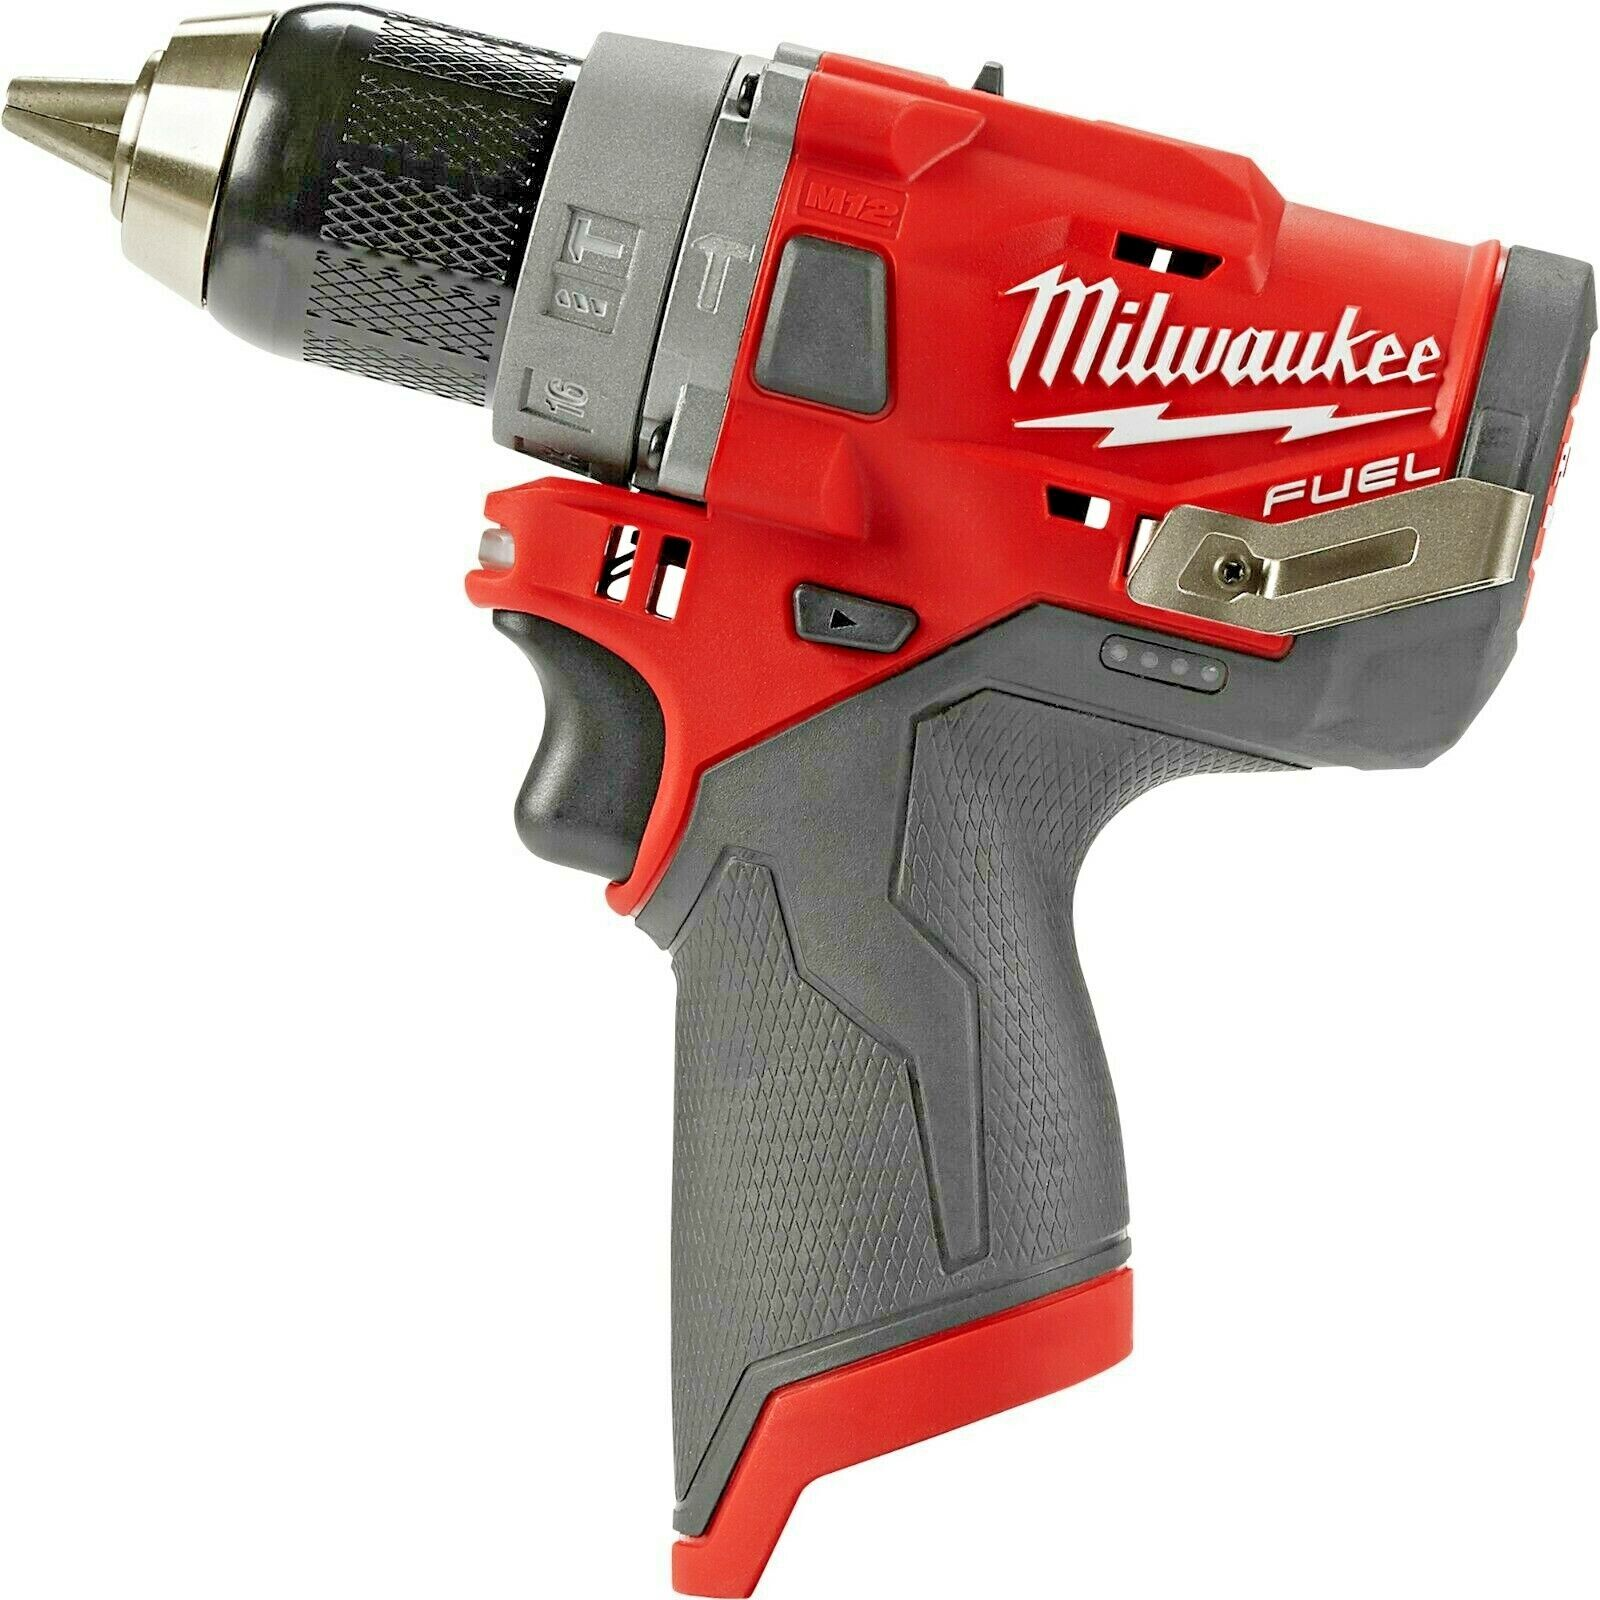 MILWAUKEE 2504-20 M12 FUEL BRUSHLESS CORDLESS 1/2 IN. HAMMER